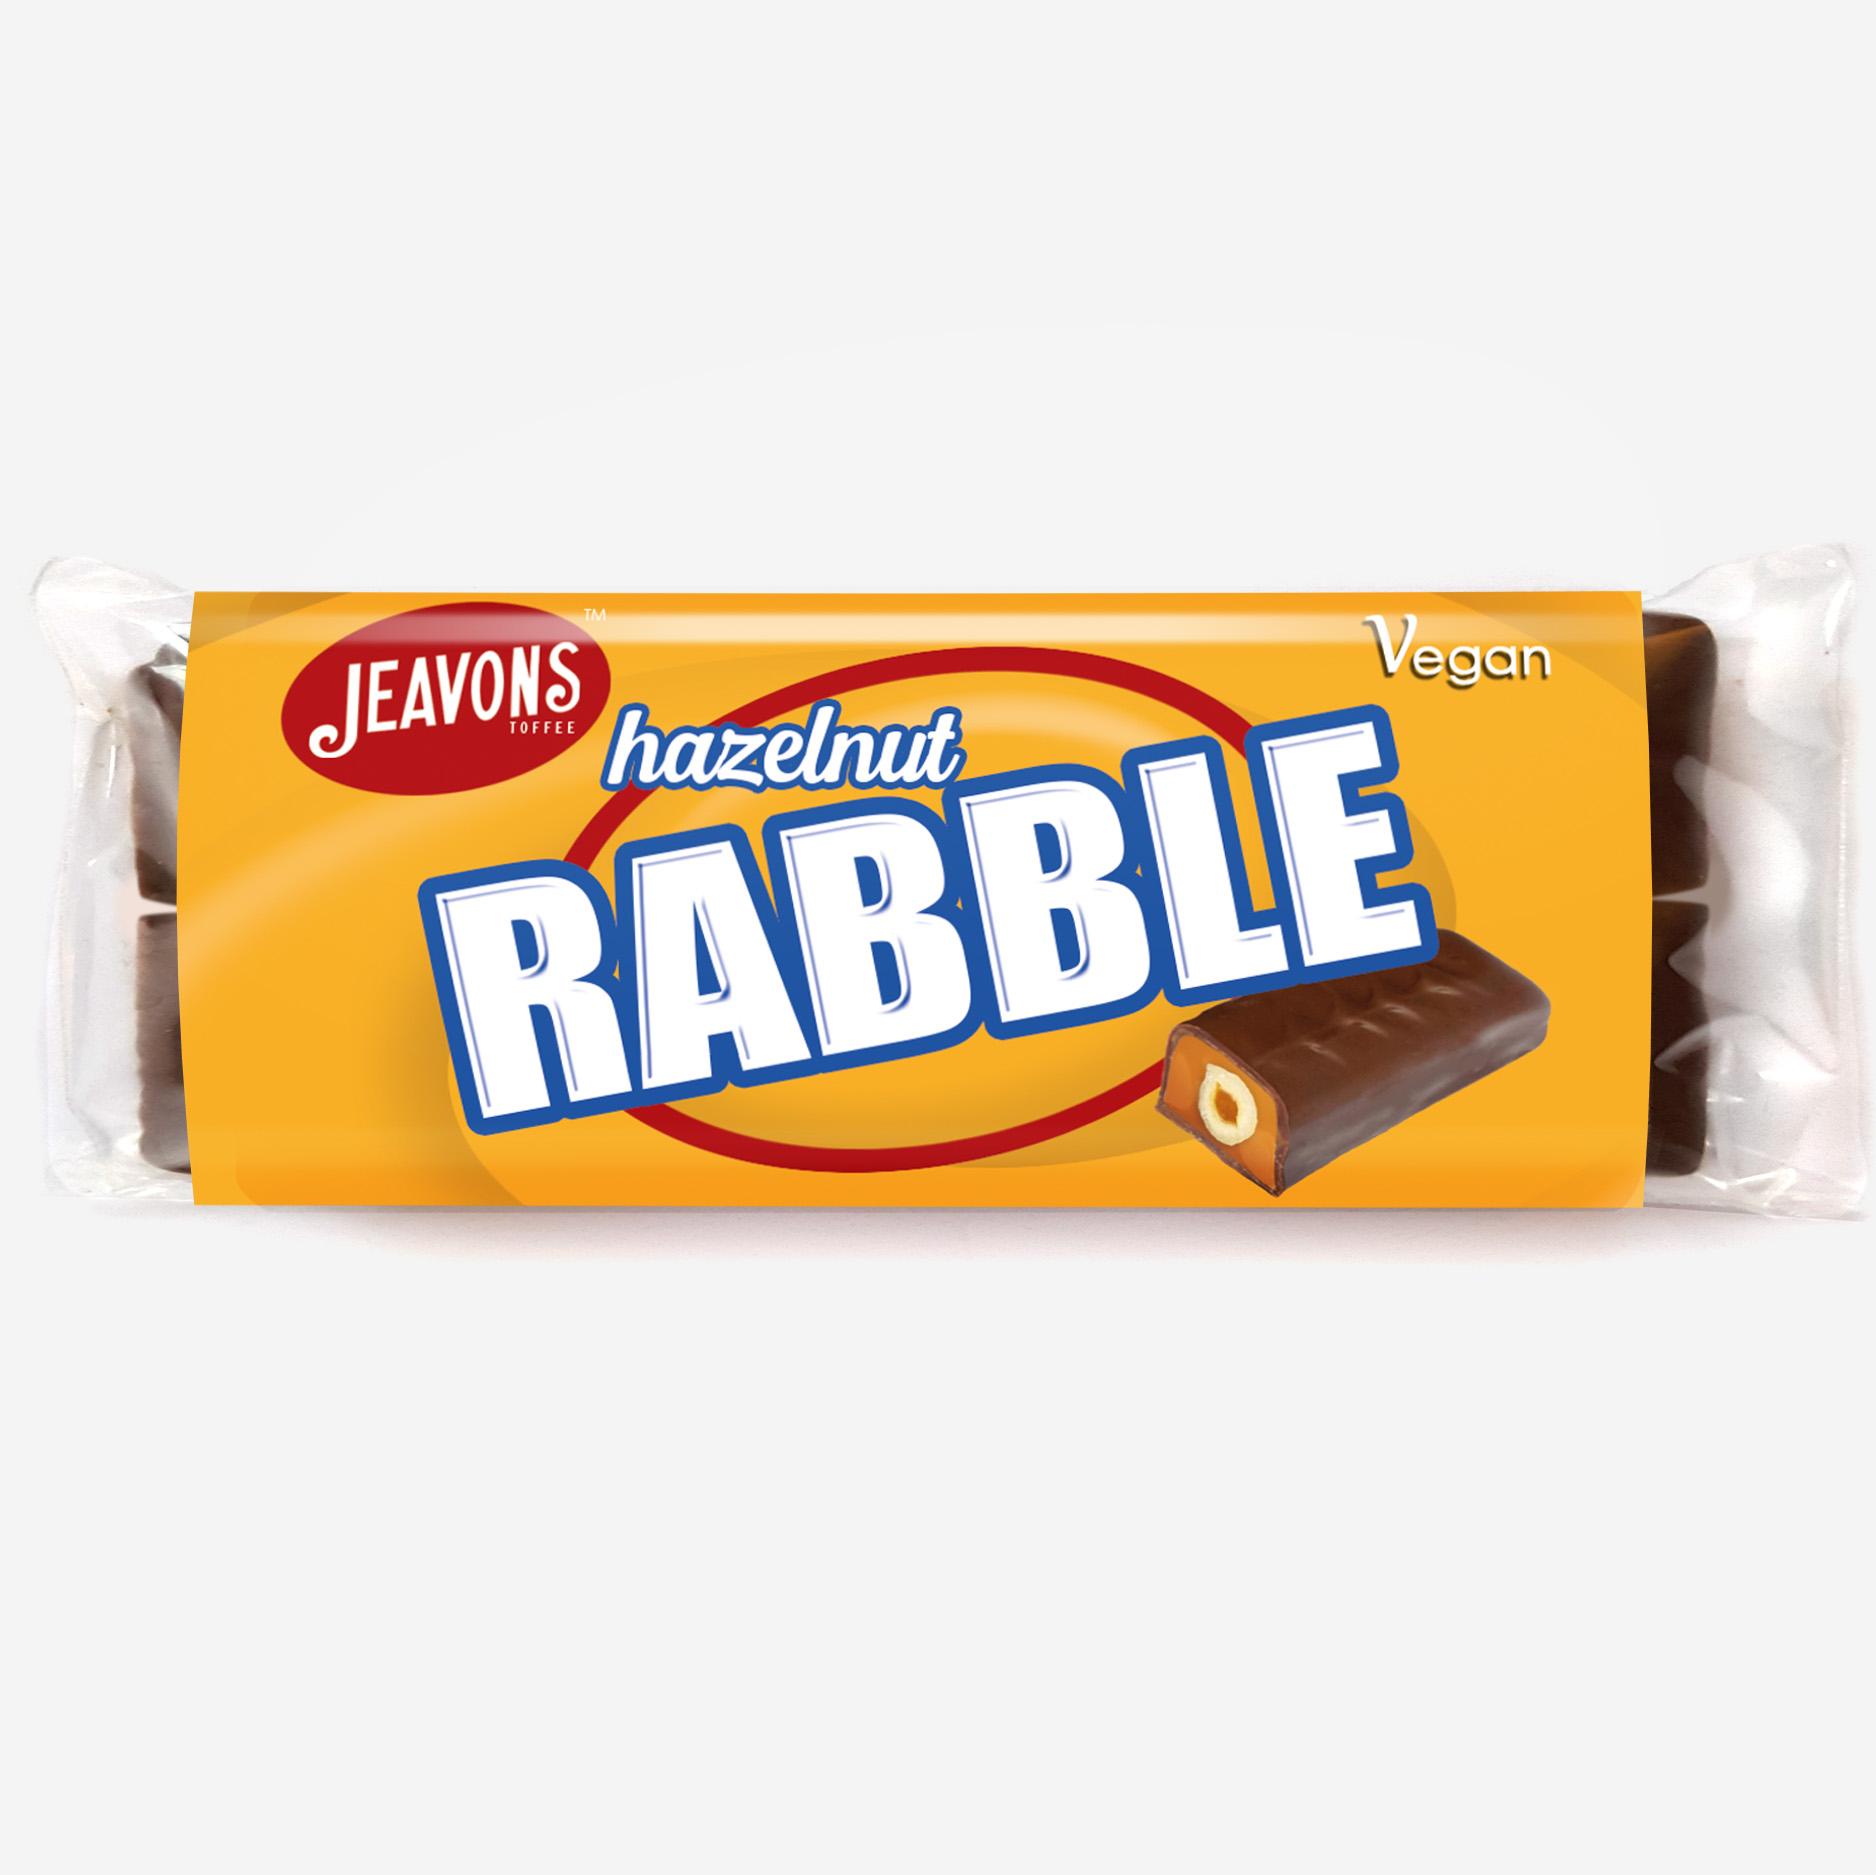 Jeavons - Hazelnut Rabble